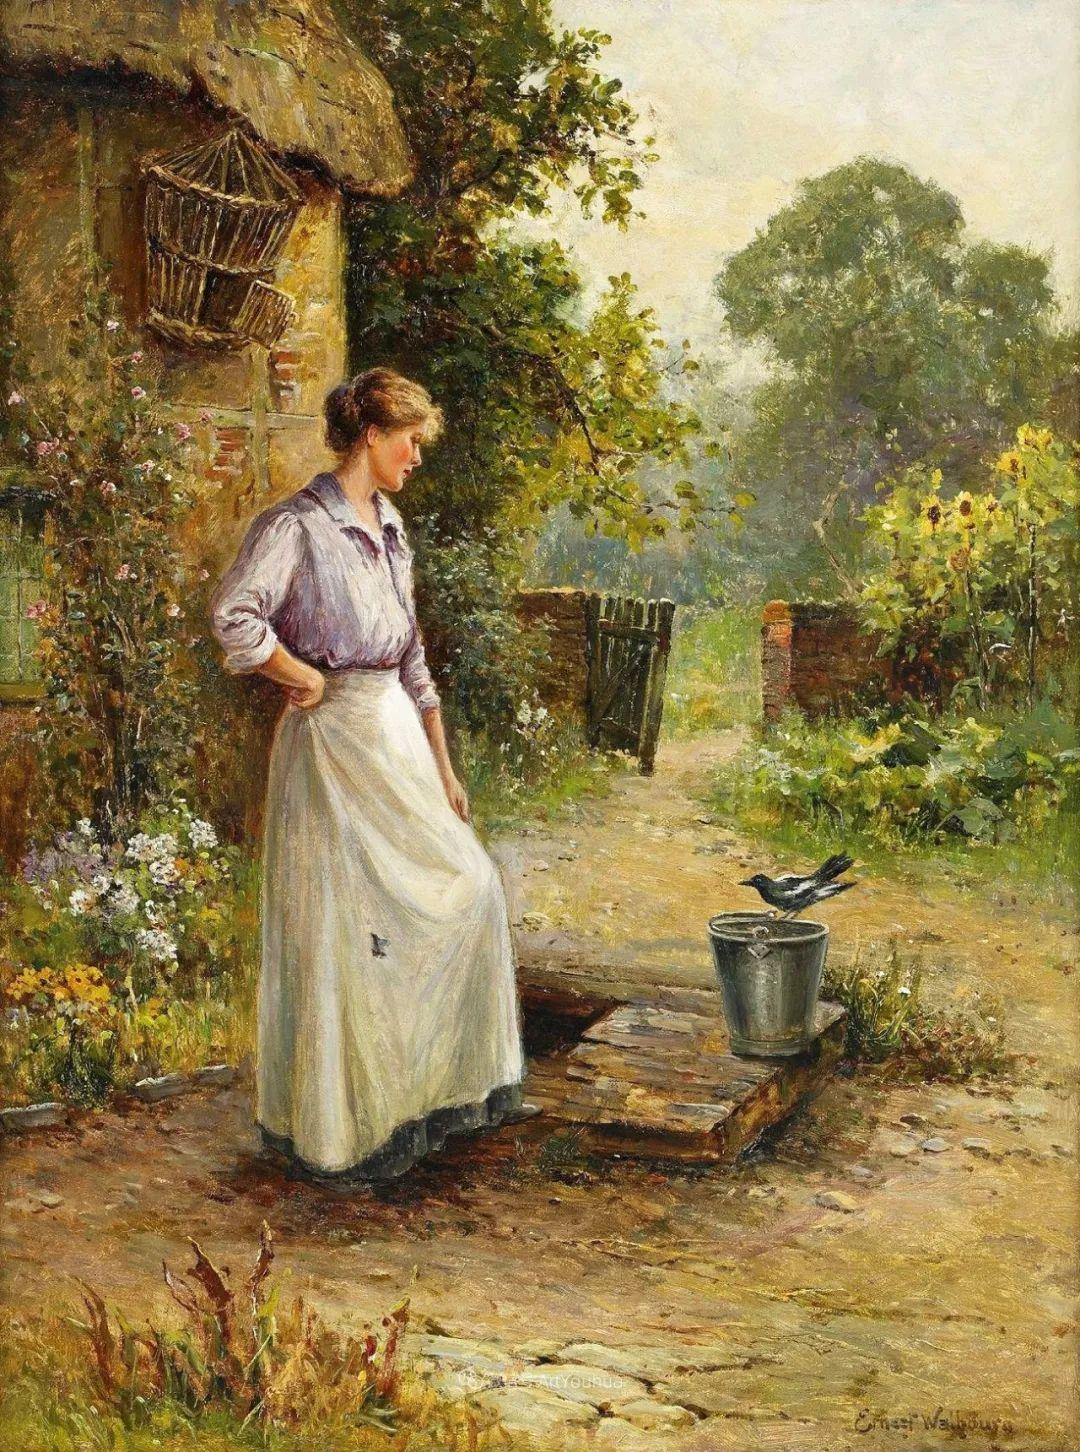 美丽村姑与诗意田园,英国画家Ernest Charles Walbourn作品(下)插图39